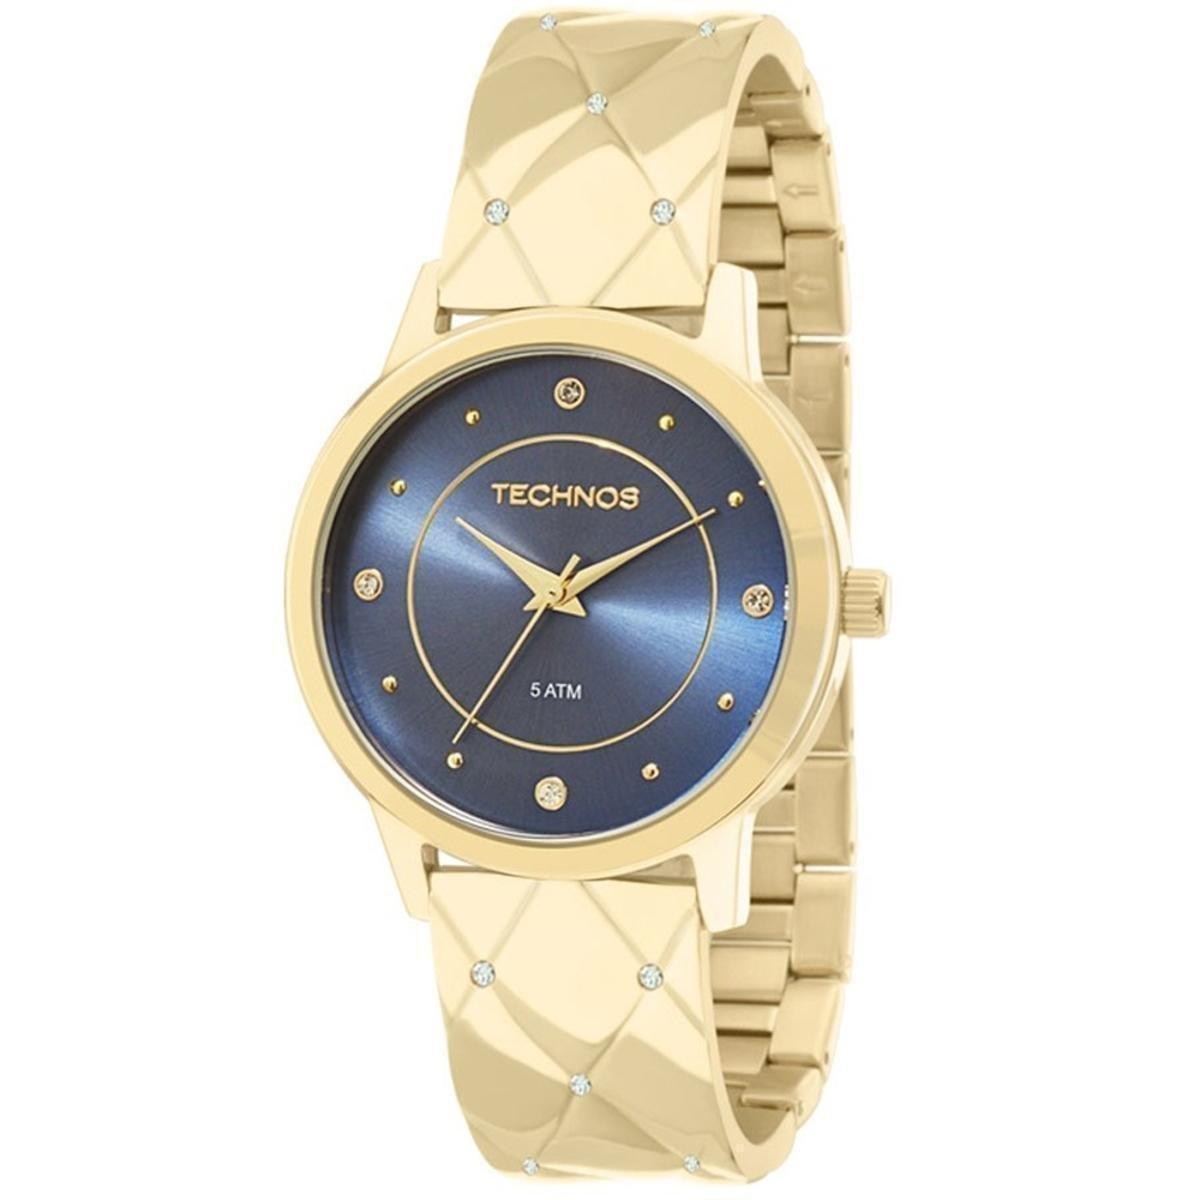 aa88d7dd9dabc Relógio Feminino Technos Analogico Elegance - Compre Agora   Netshoes